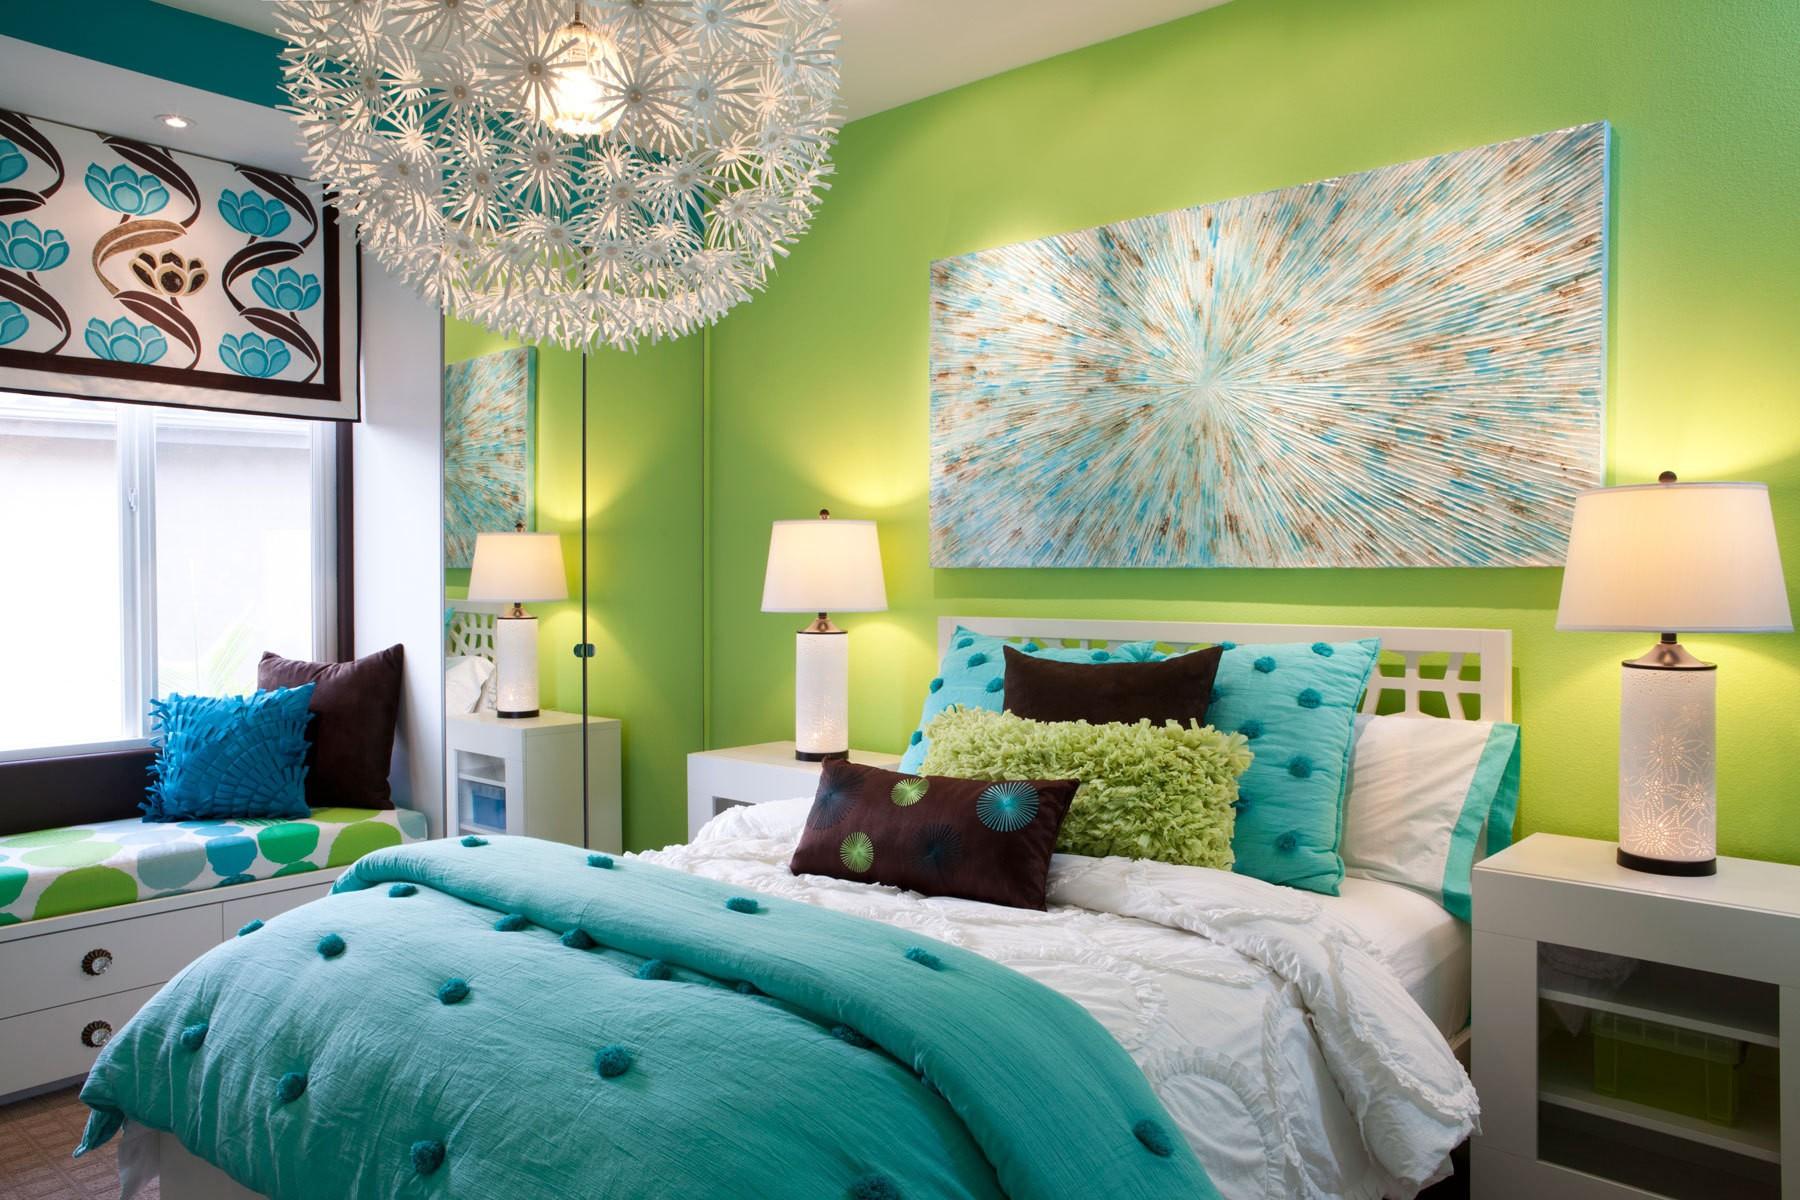 miracle green blue decoration 2 معجزه رنگ سبز آبی در دکوراسیون